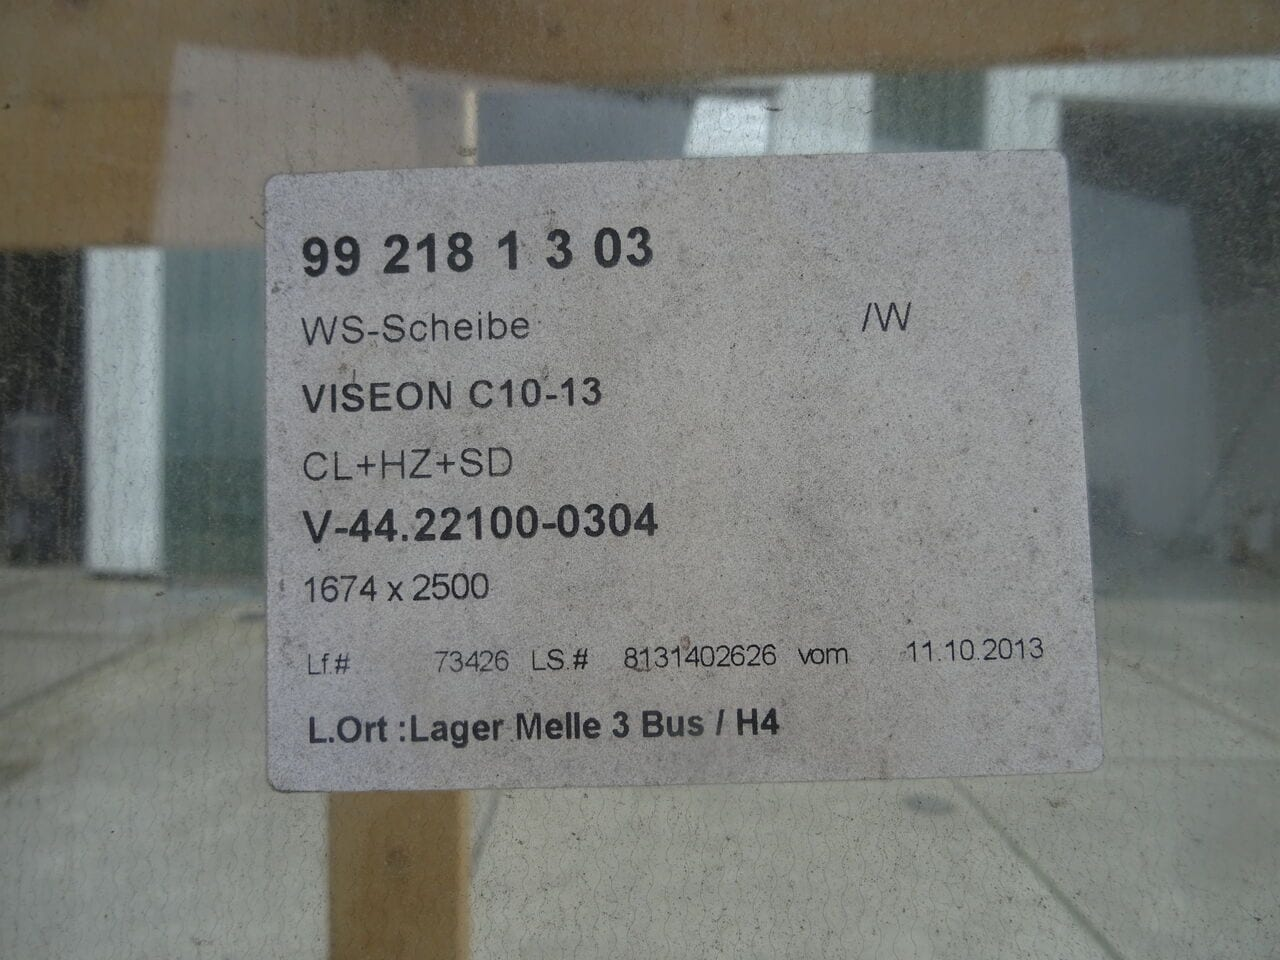 spare-part-windshieldMAN-Viseon-C13---1625218474728594709_big_8268af01810f7e68e721aeb14e8499a1--21070212292616109000